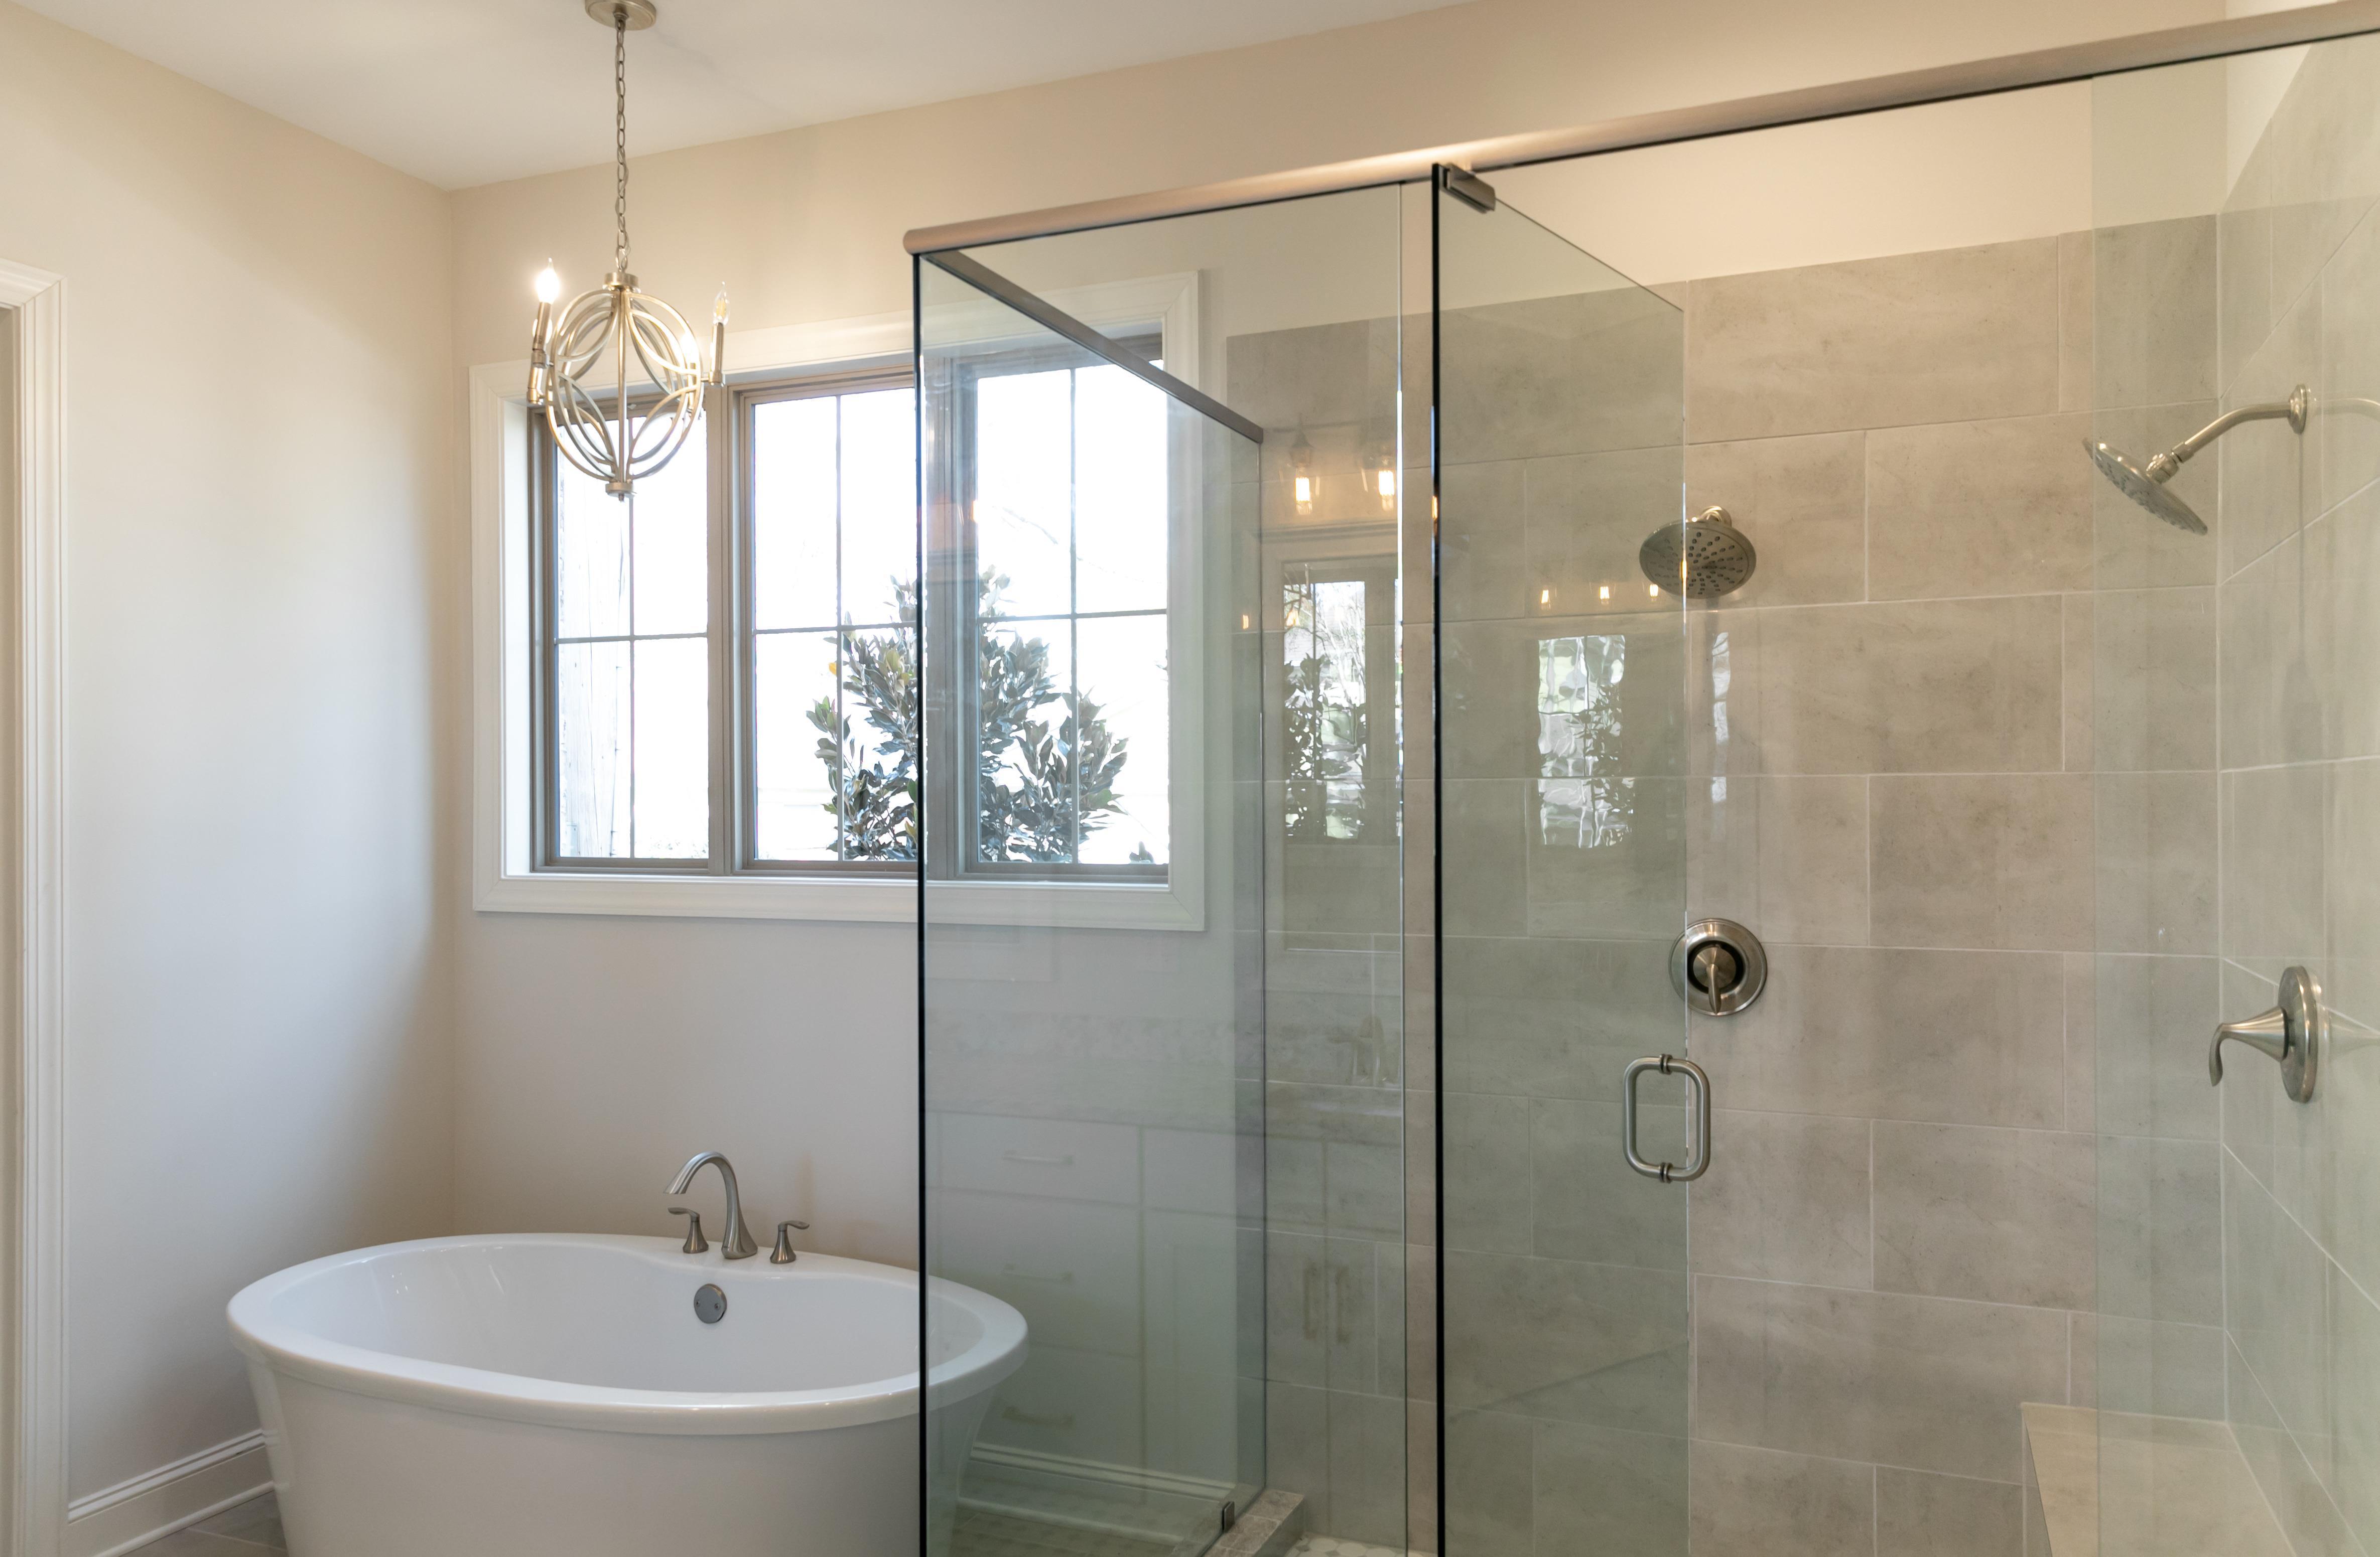 Bathroom featured in the Fletcher By Regency Homebuilders in Memphis, TN